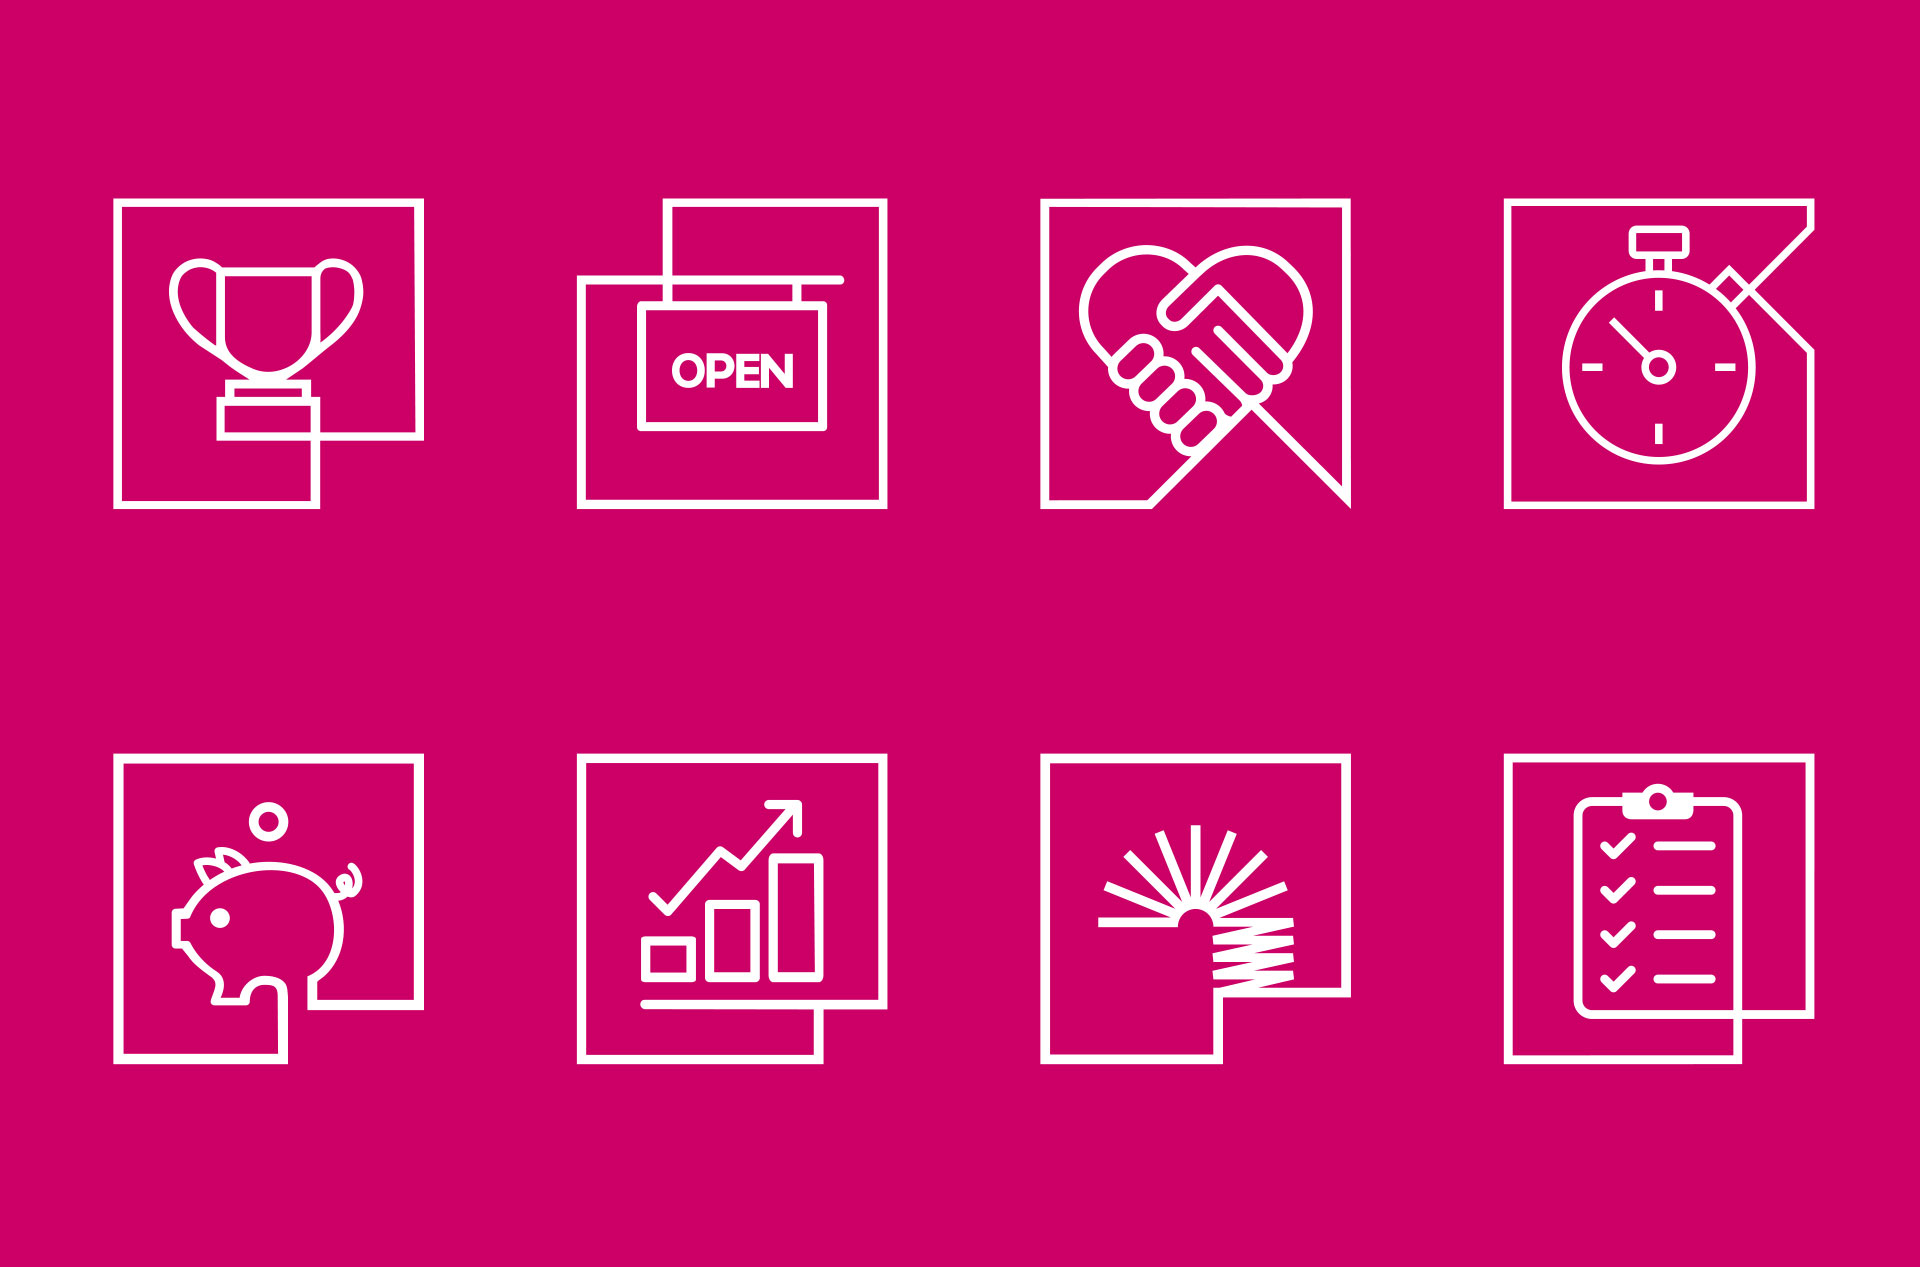 Glendale Creative Shawbrook Bank Icon Design